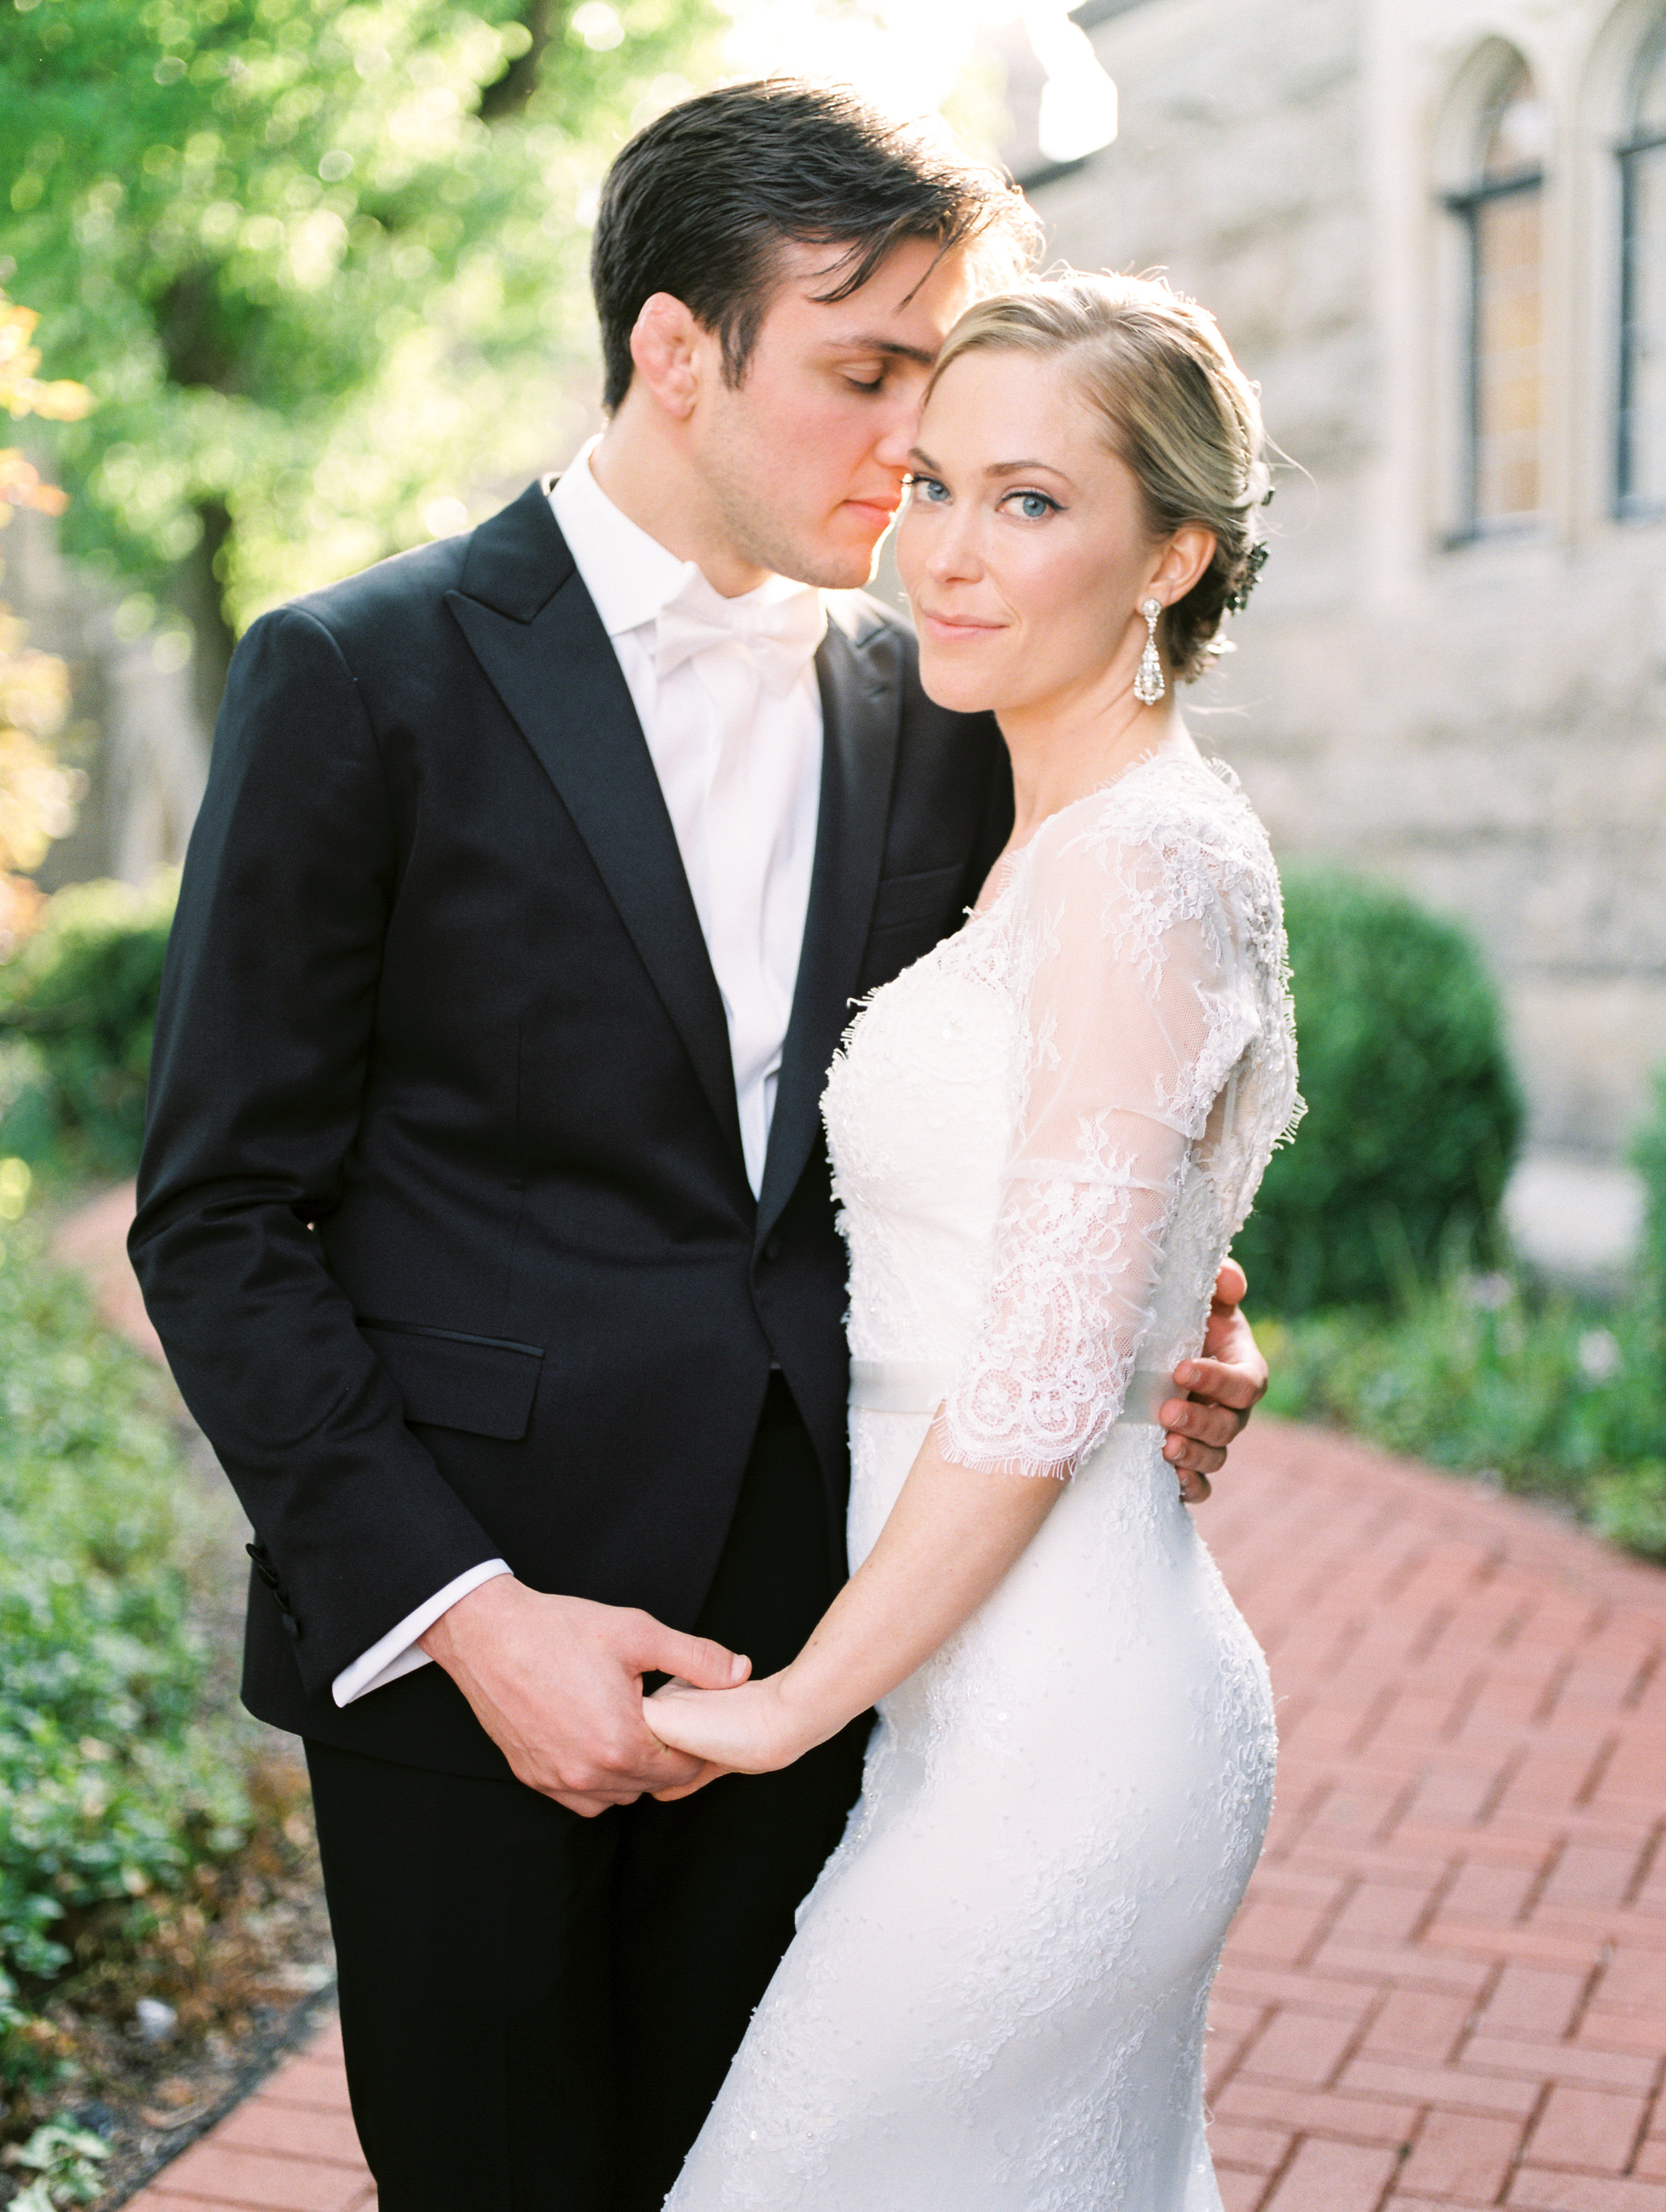 Hartnett Wedding by Michelle Lange Photography - 0306.JPG